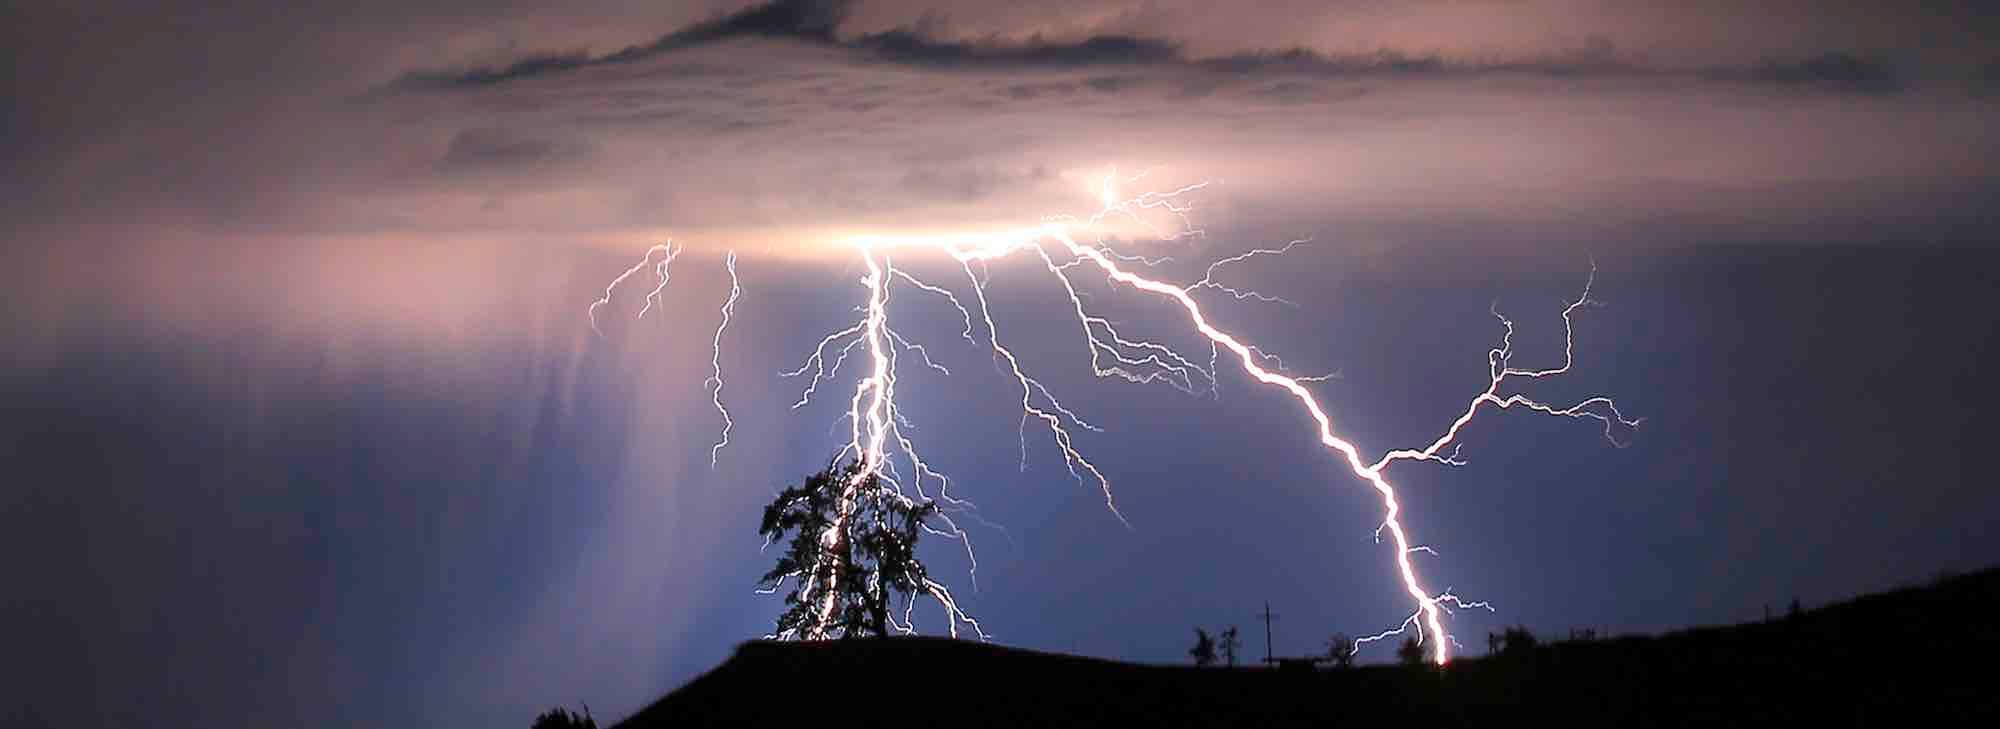 Perpetua Neo Psychotherapy brighton Anxiety Lightning